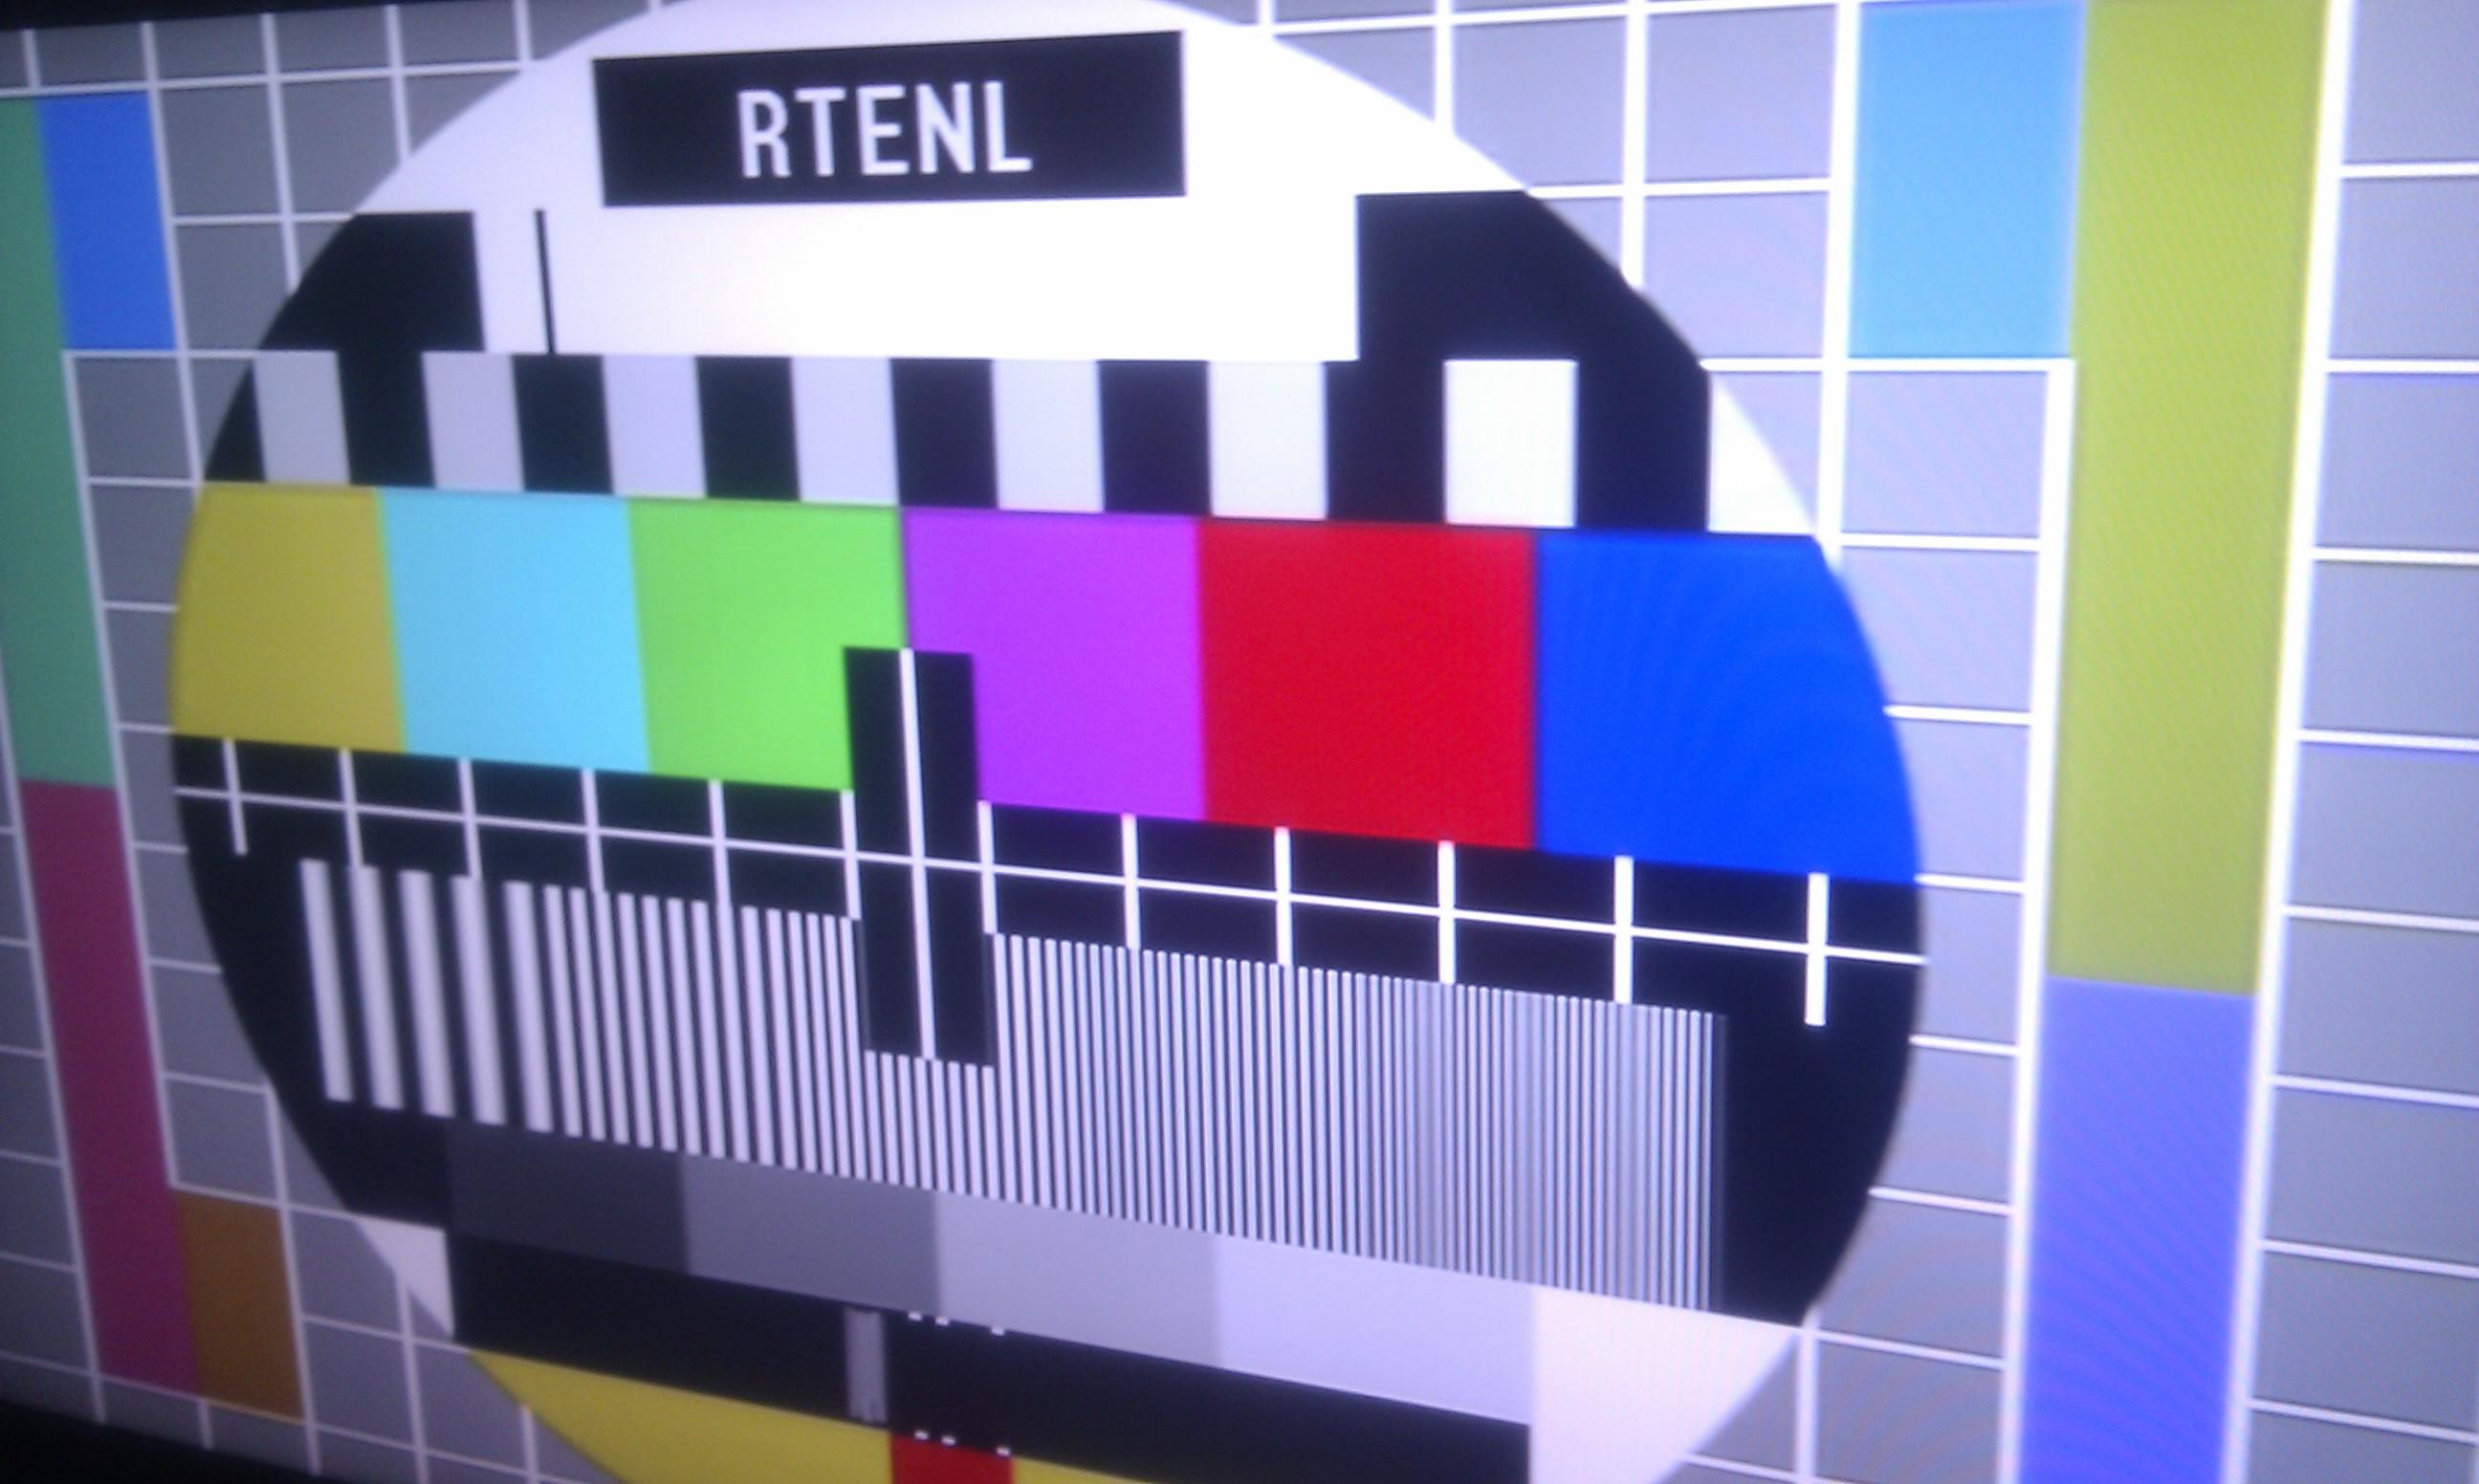 Digital TV test card